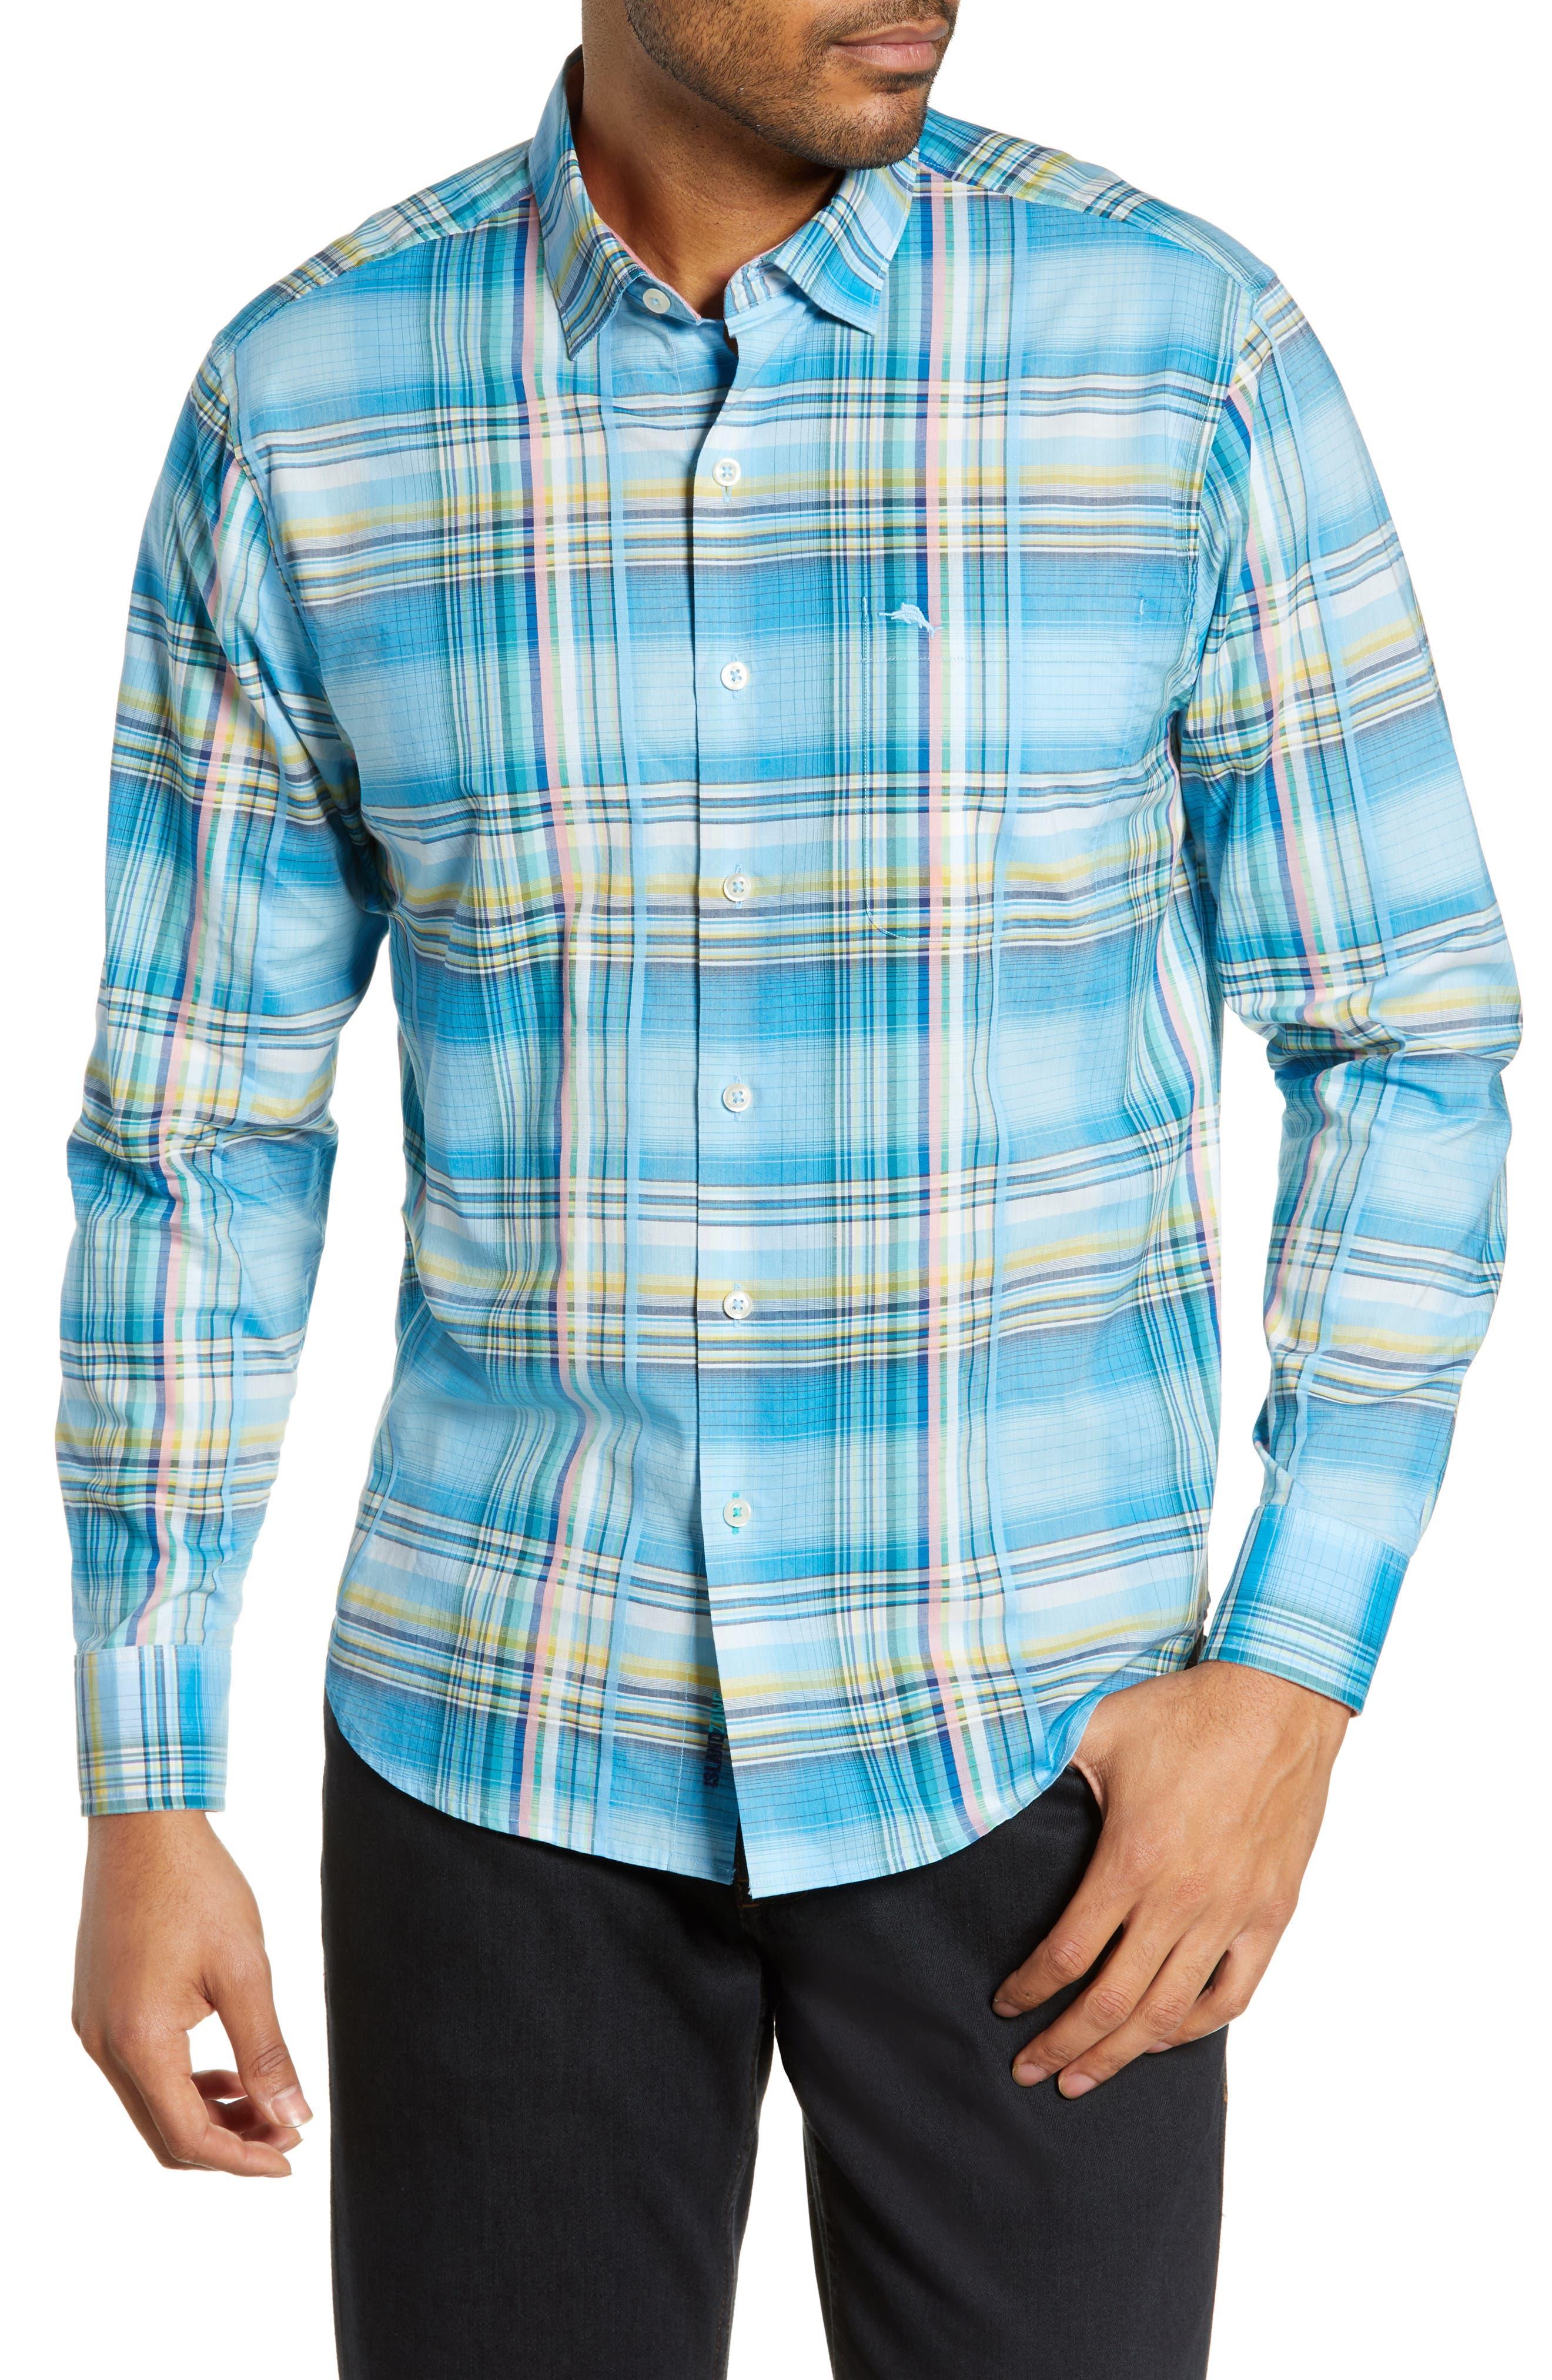 Palau Classic Fit Plaid Sport Shirt, Main, color, BEACH HUT BLUE